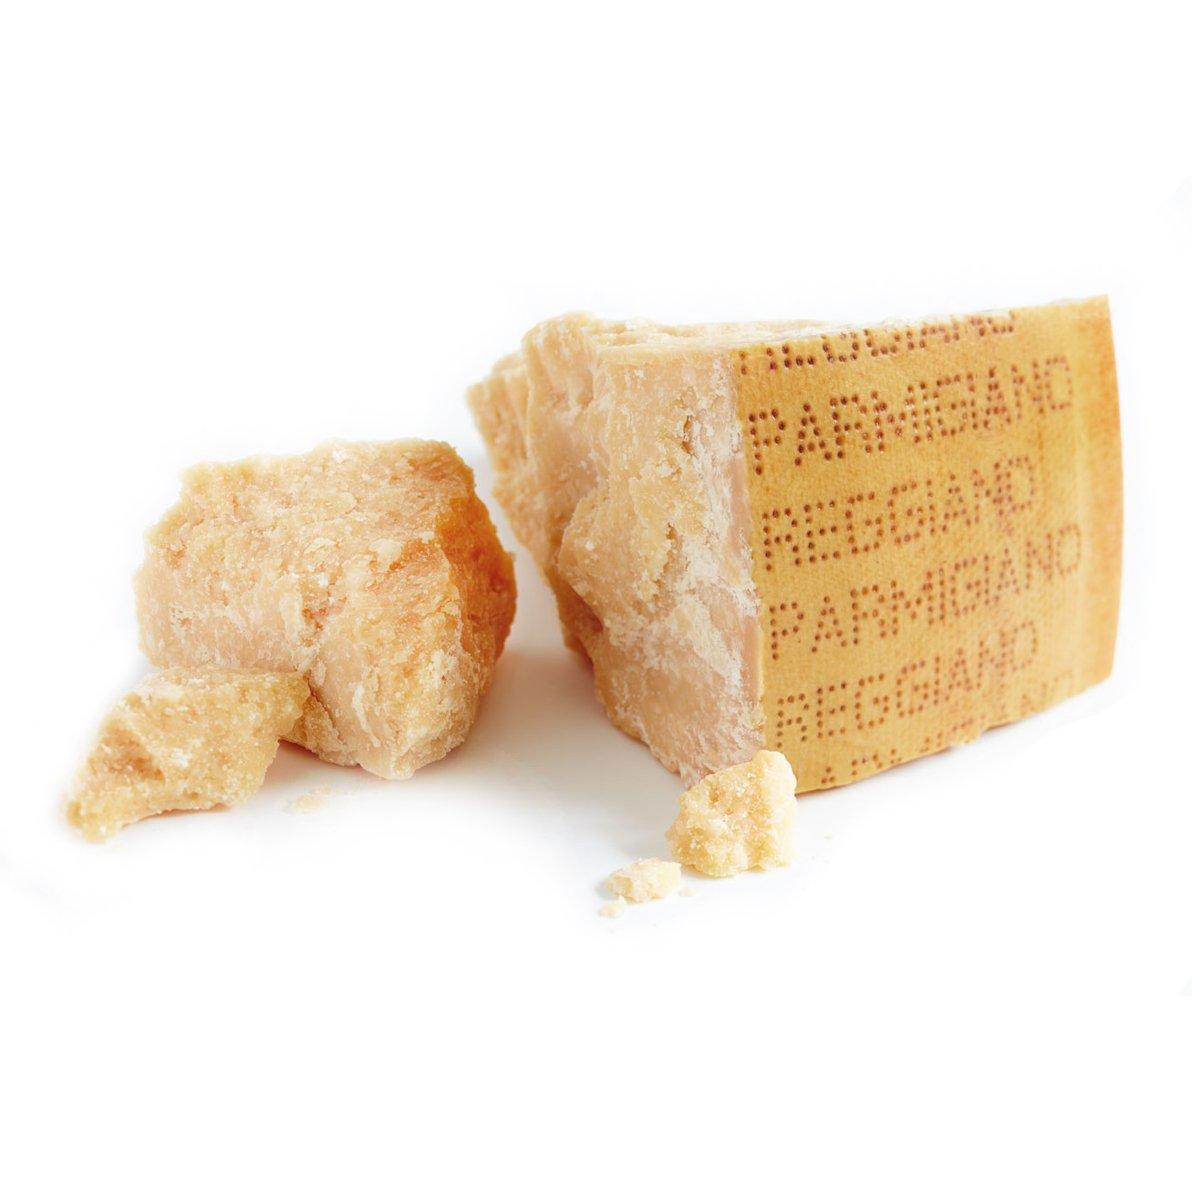 Parmigiano Reggiano Cheese (5 pound) by Alma Gourmet (Image #1)